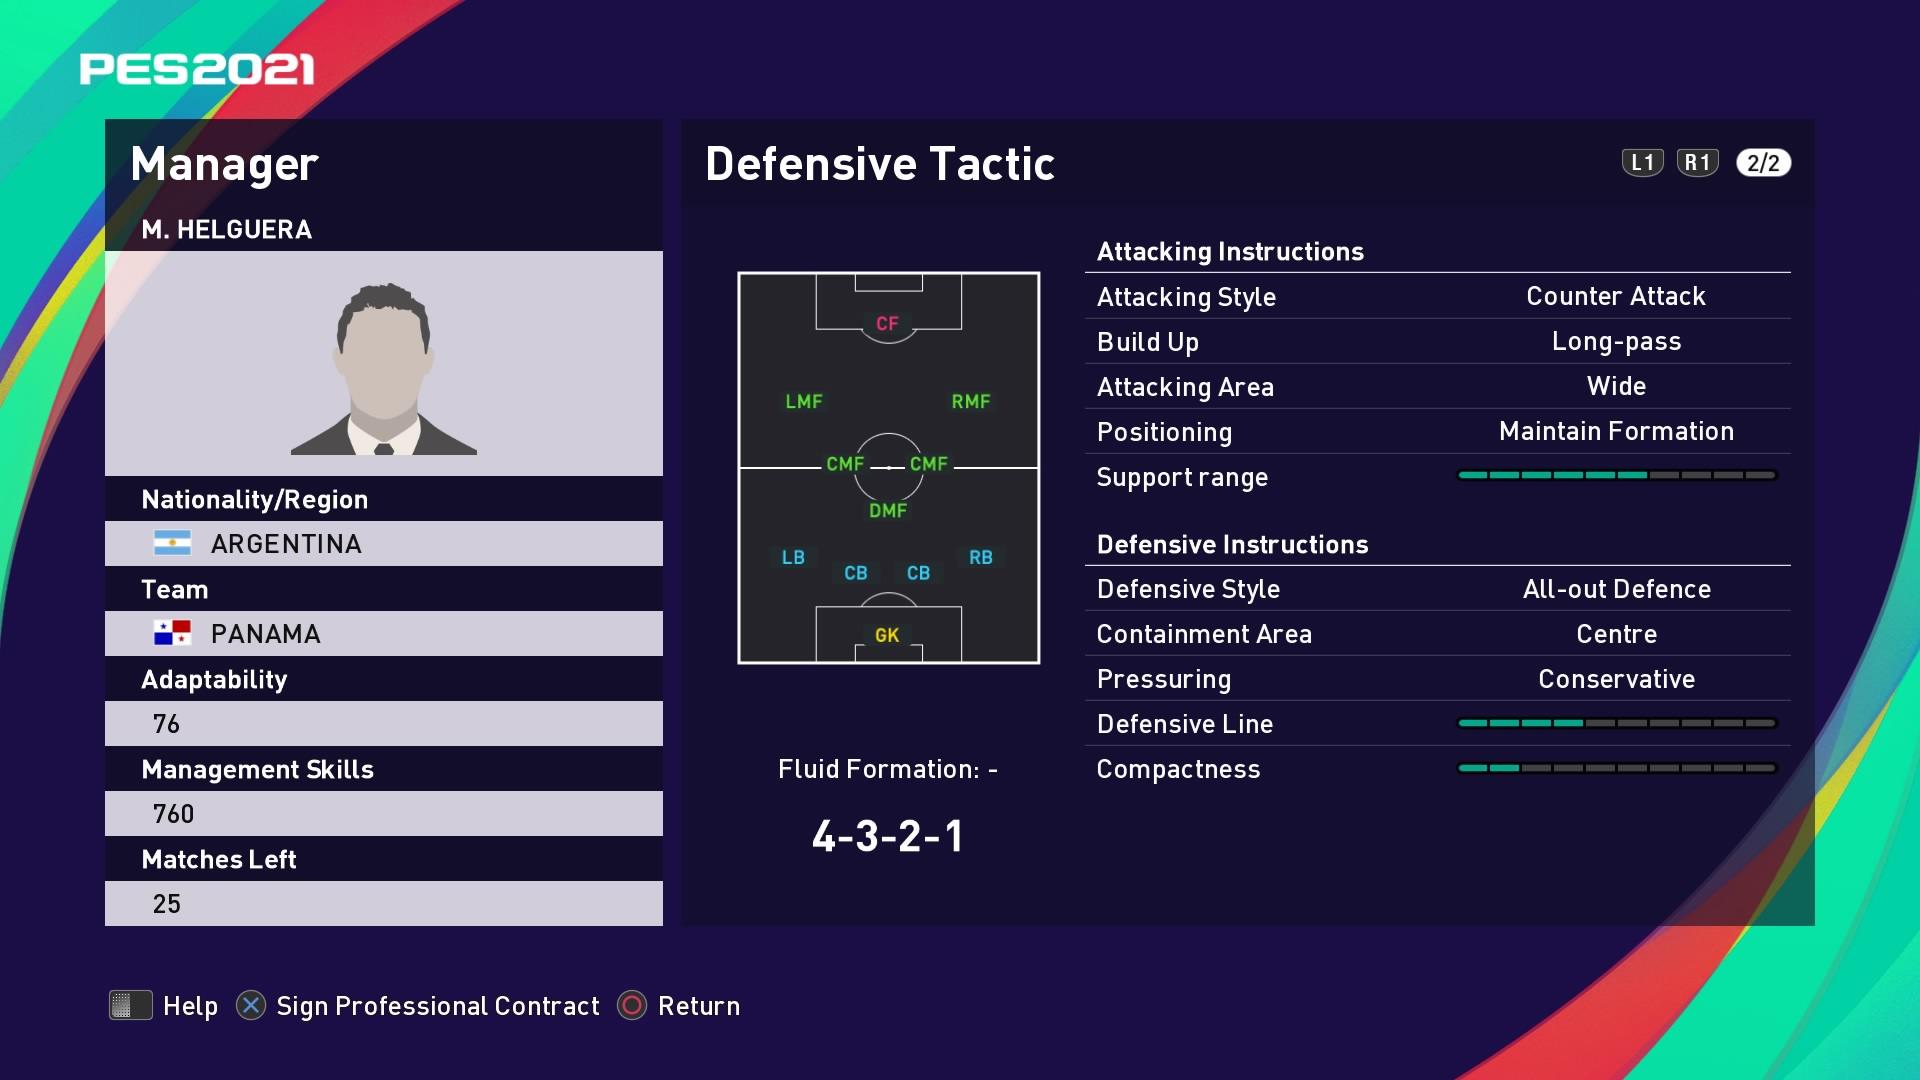 M. Helguera (Américo Gallego) Defensive Tactic in PES 2021 myClub